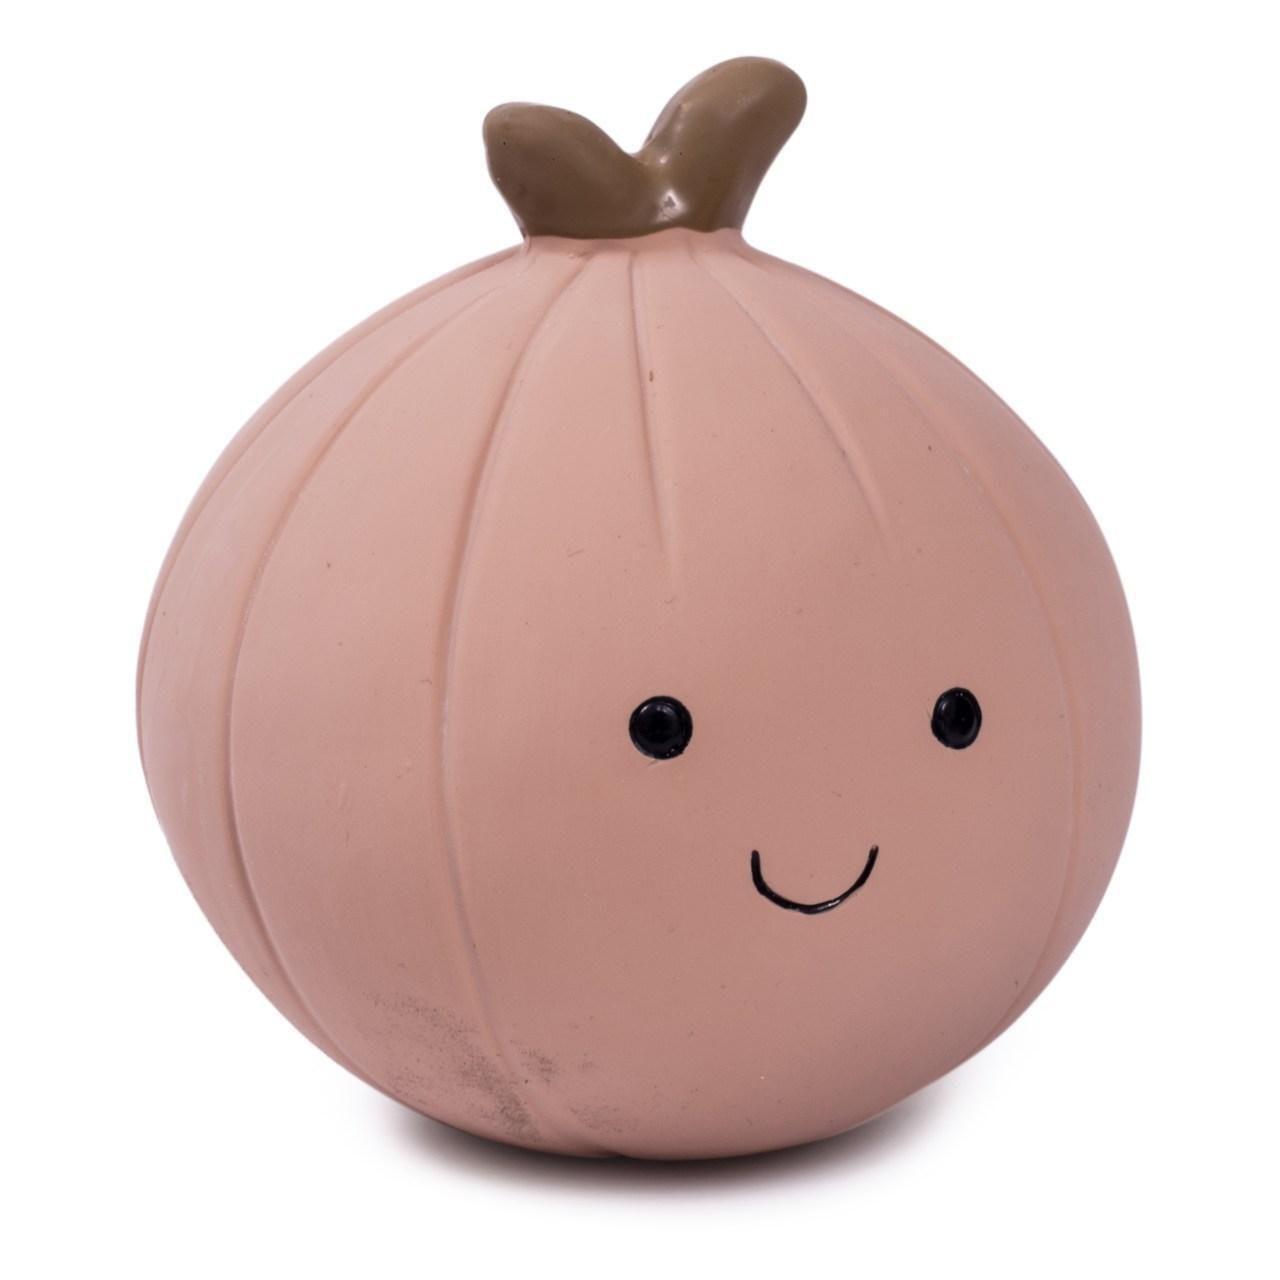 Petface Latex Onion Large Dog Toy